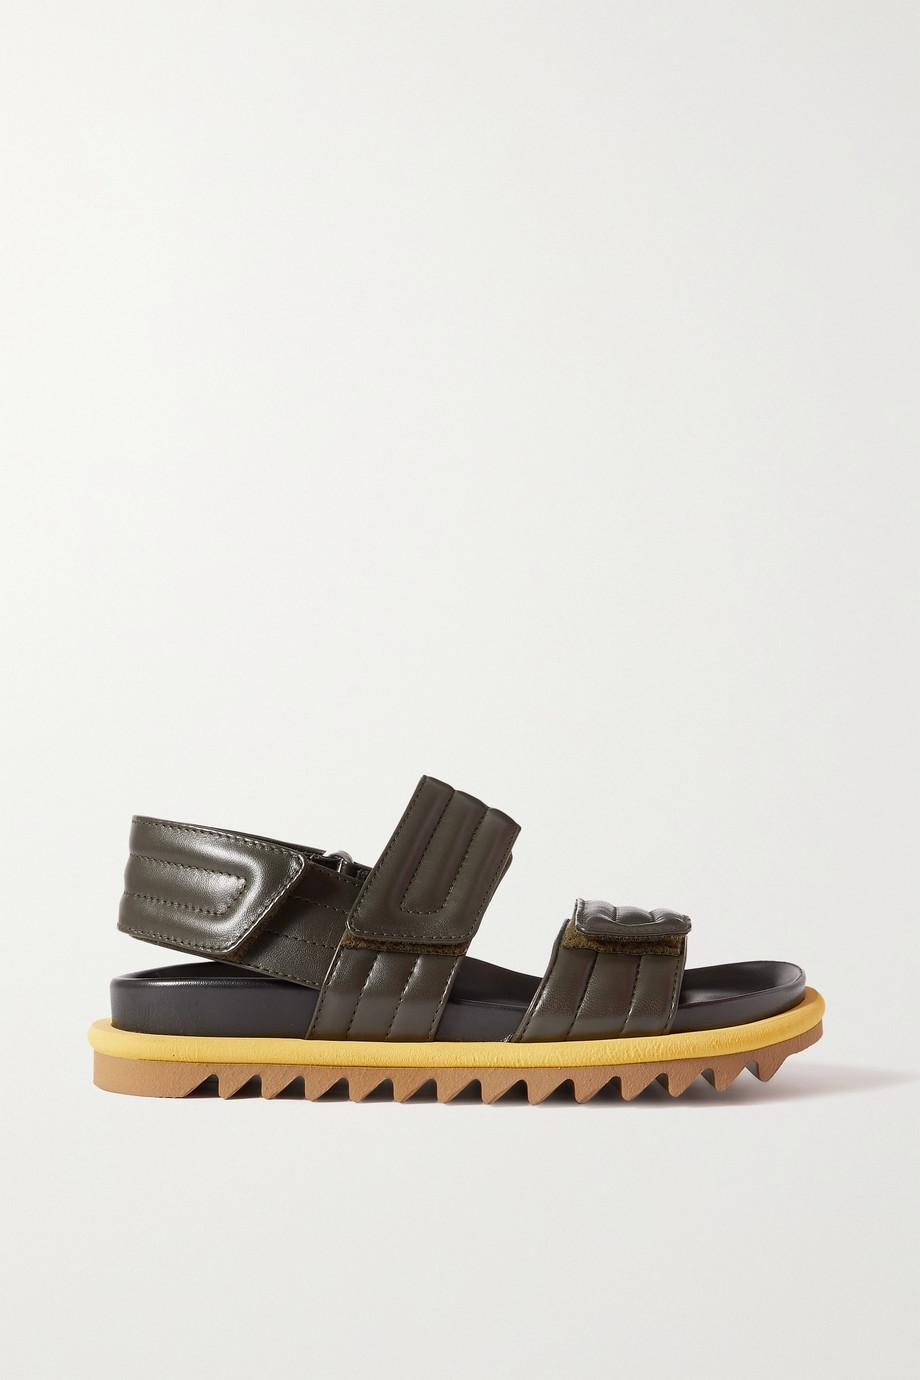 Dries Van Noten Sandalen aus gestepptem Leder